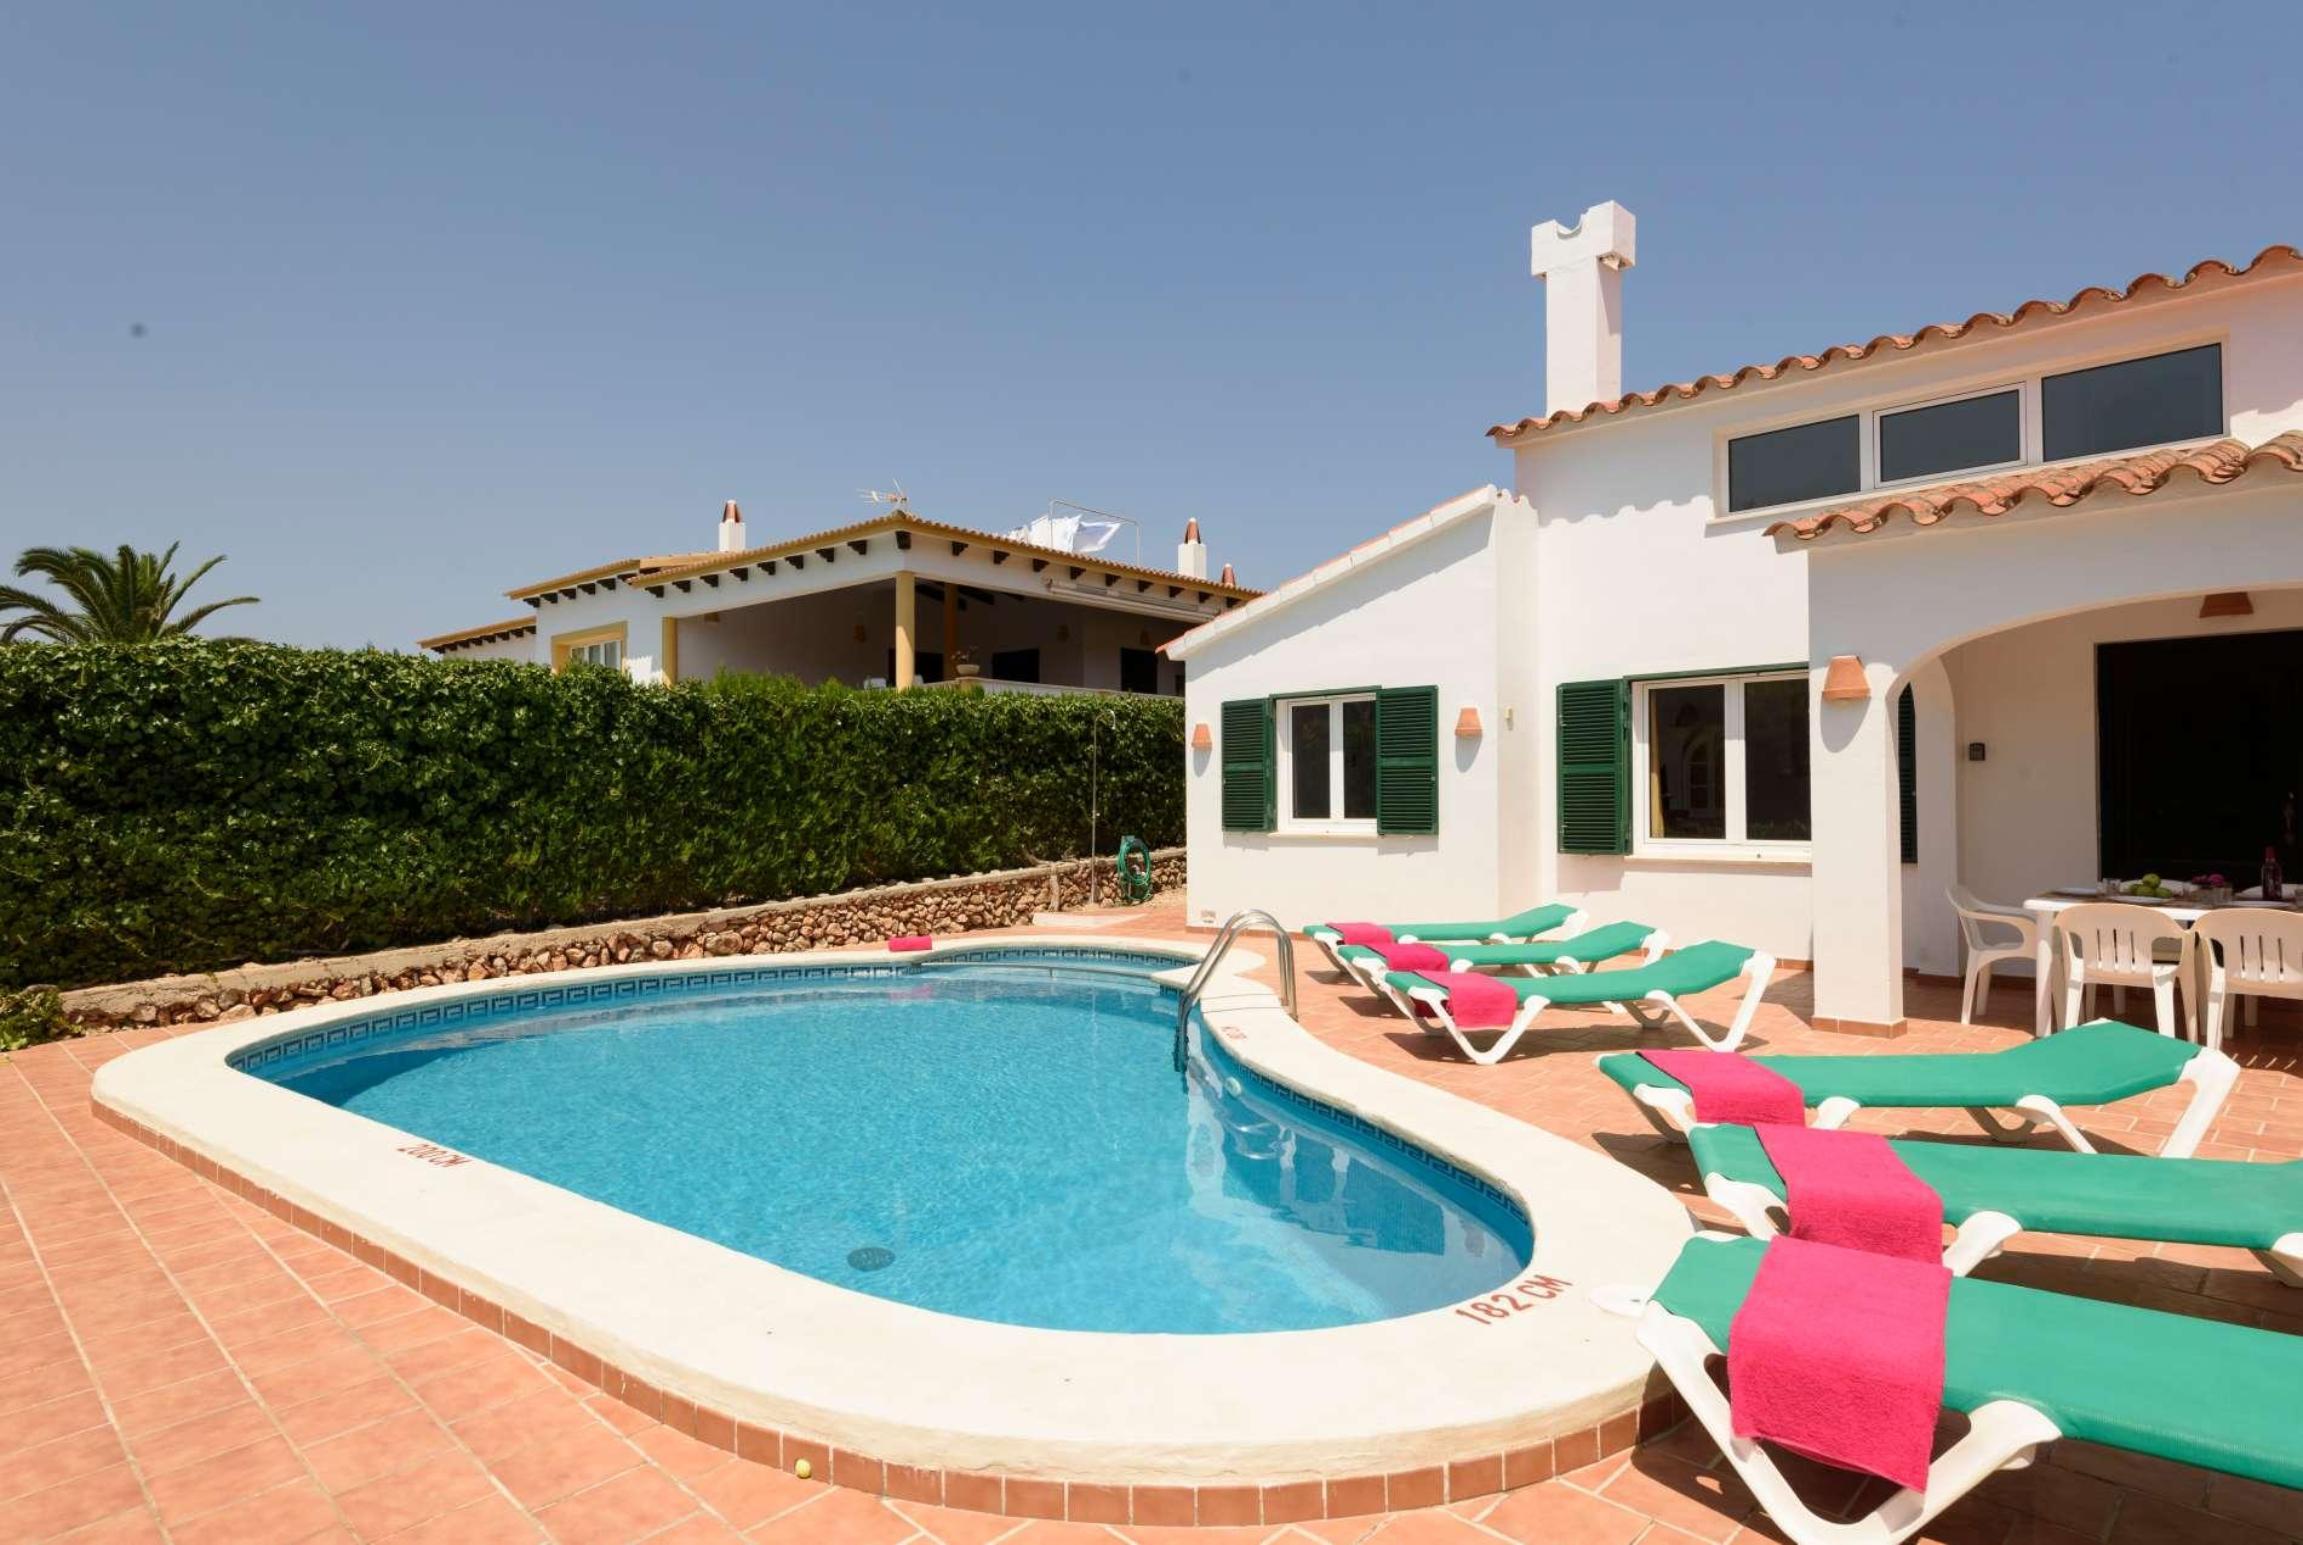 Ferienhaus Eulalia II (2653368), Arenal De'N Castell, Menorca, Balearische Inseln, Spanien, Bild 20